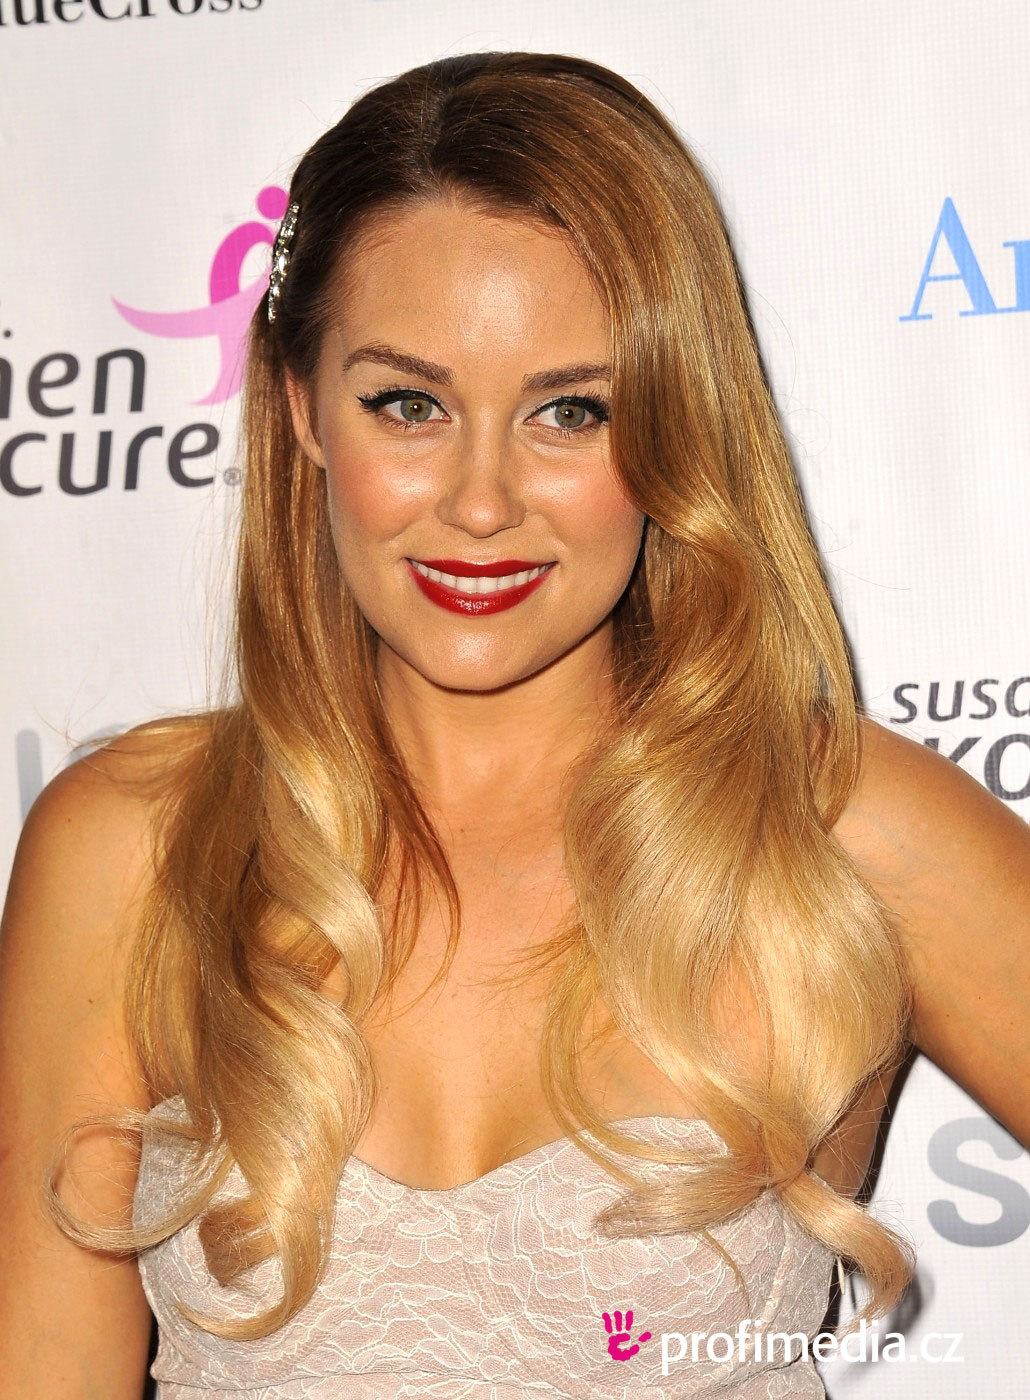 Lauren Conrad Hairstyle Easyhairstyler